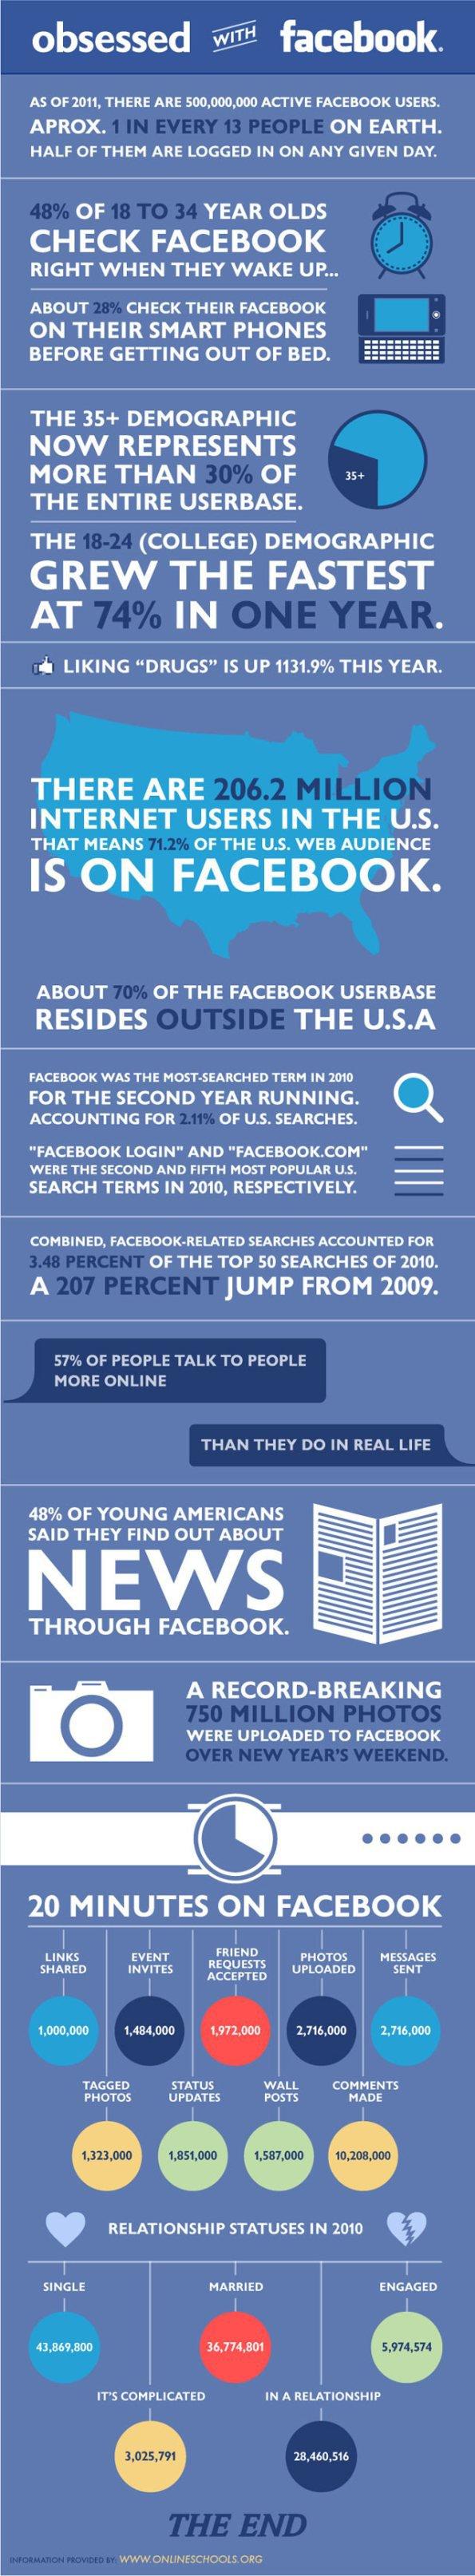 Facebook Wahnsinn - in nur 20 Minuten was passiert